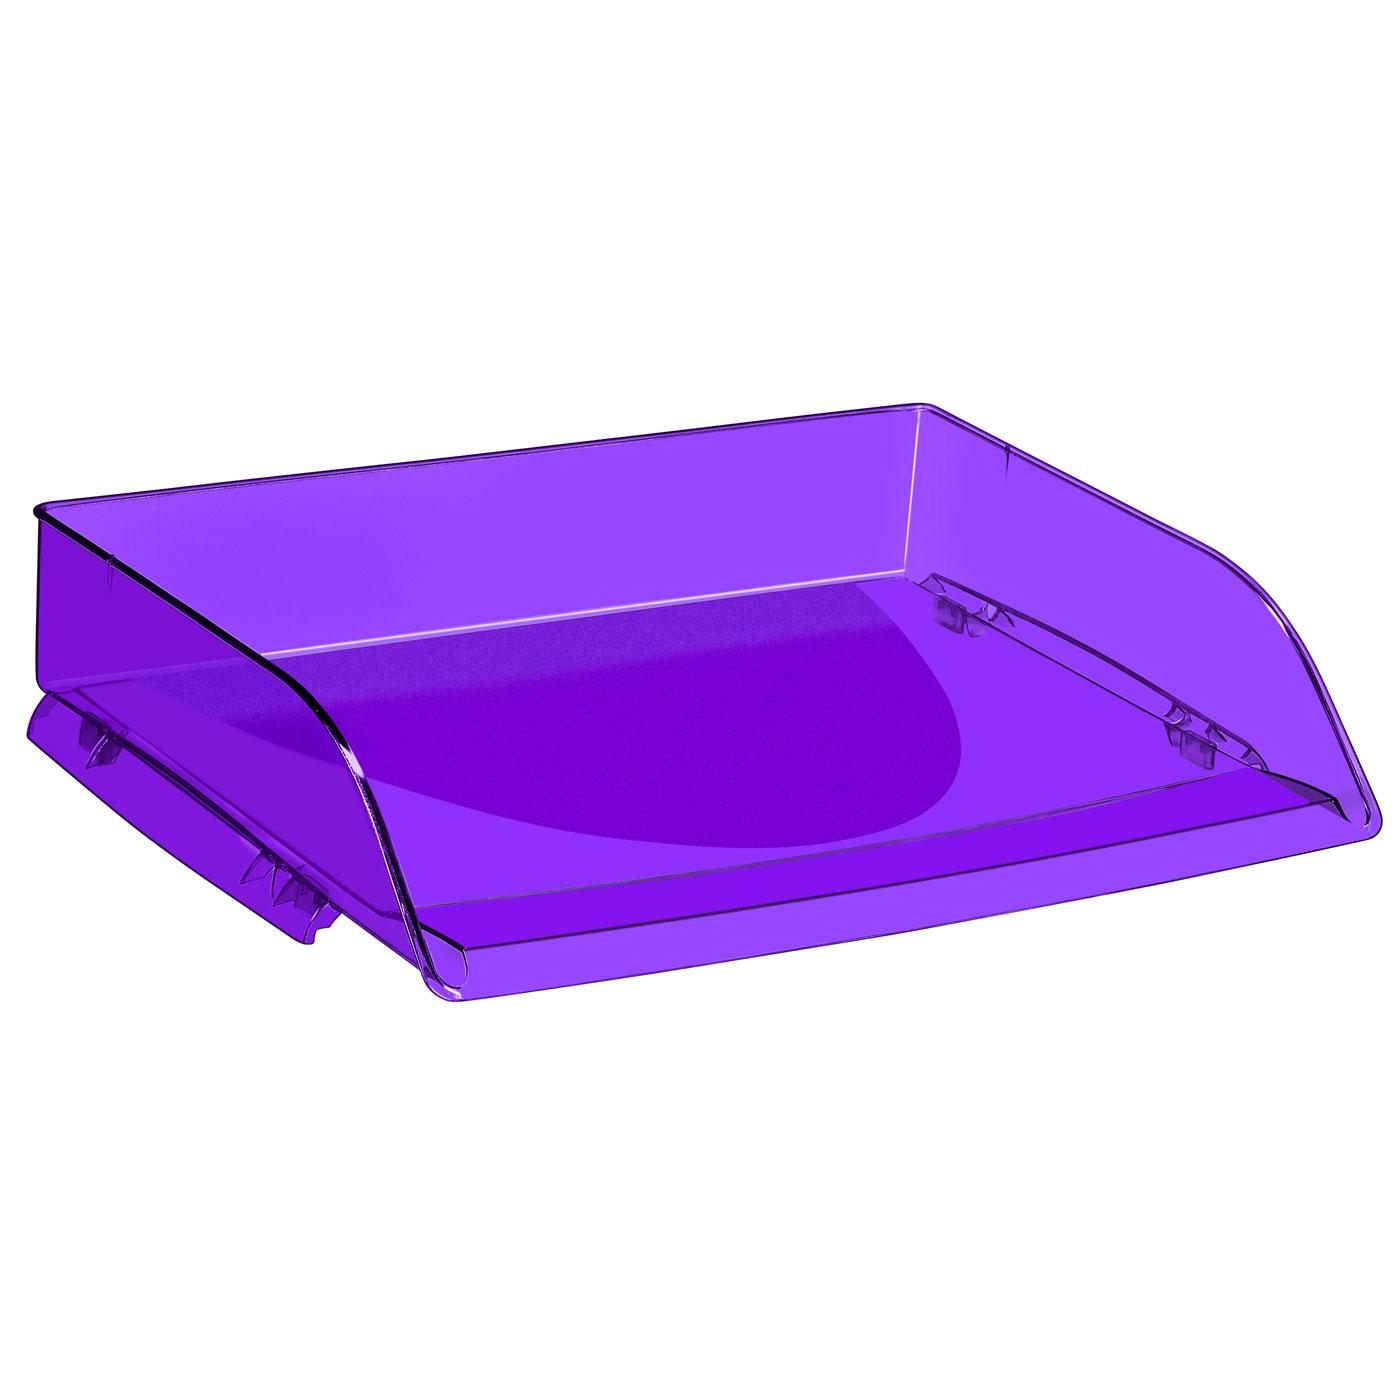 cep corbeille courrier italienne happy ultra violet corbeille courrier cep sur. Black Bedroom Furniture Sets. Home Design Ideas